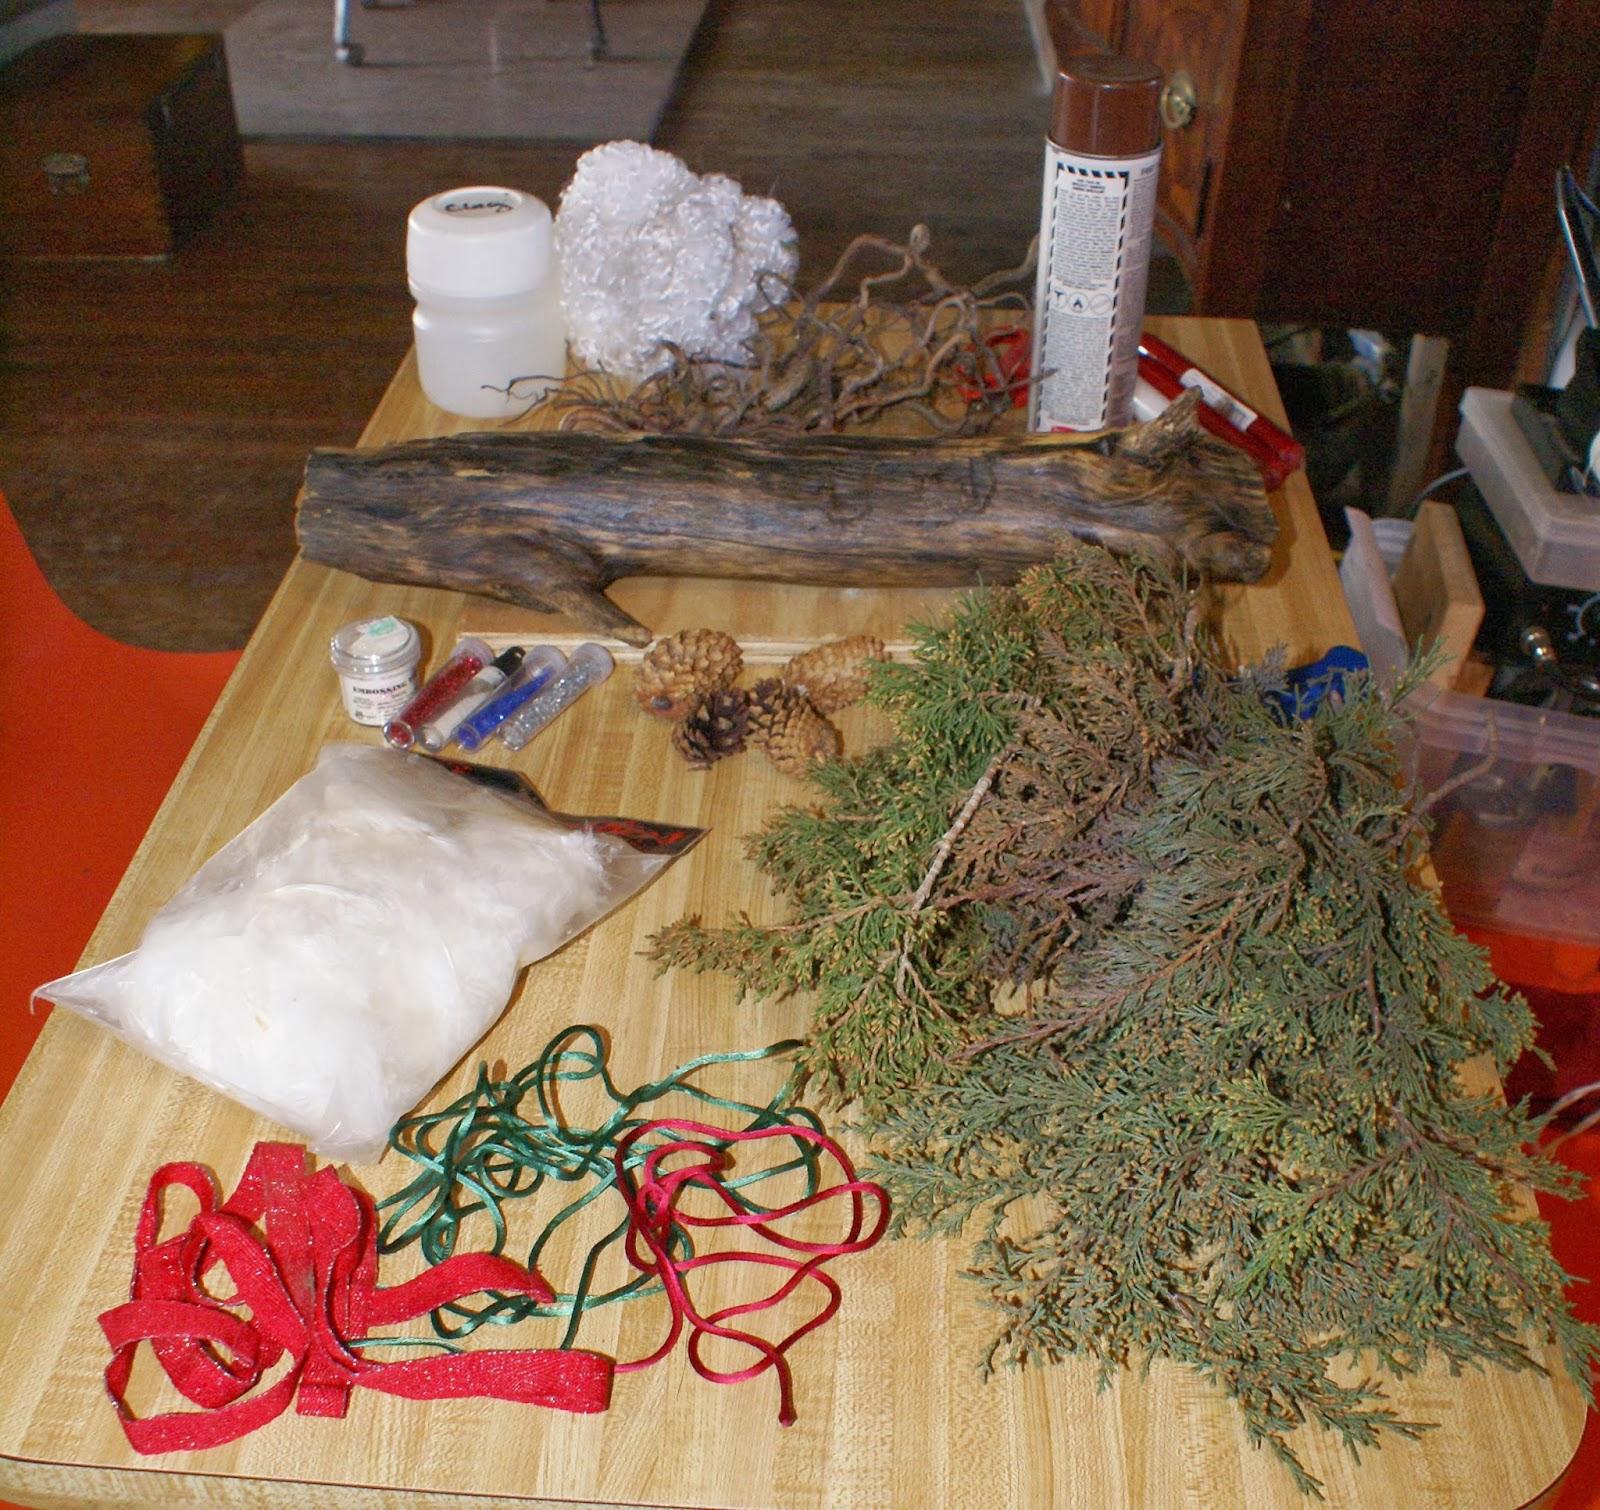 Hoodoo hill yule log christmas dinner centerpiece